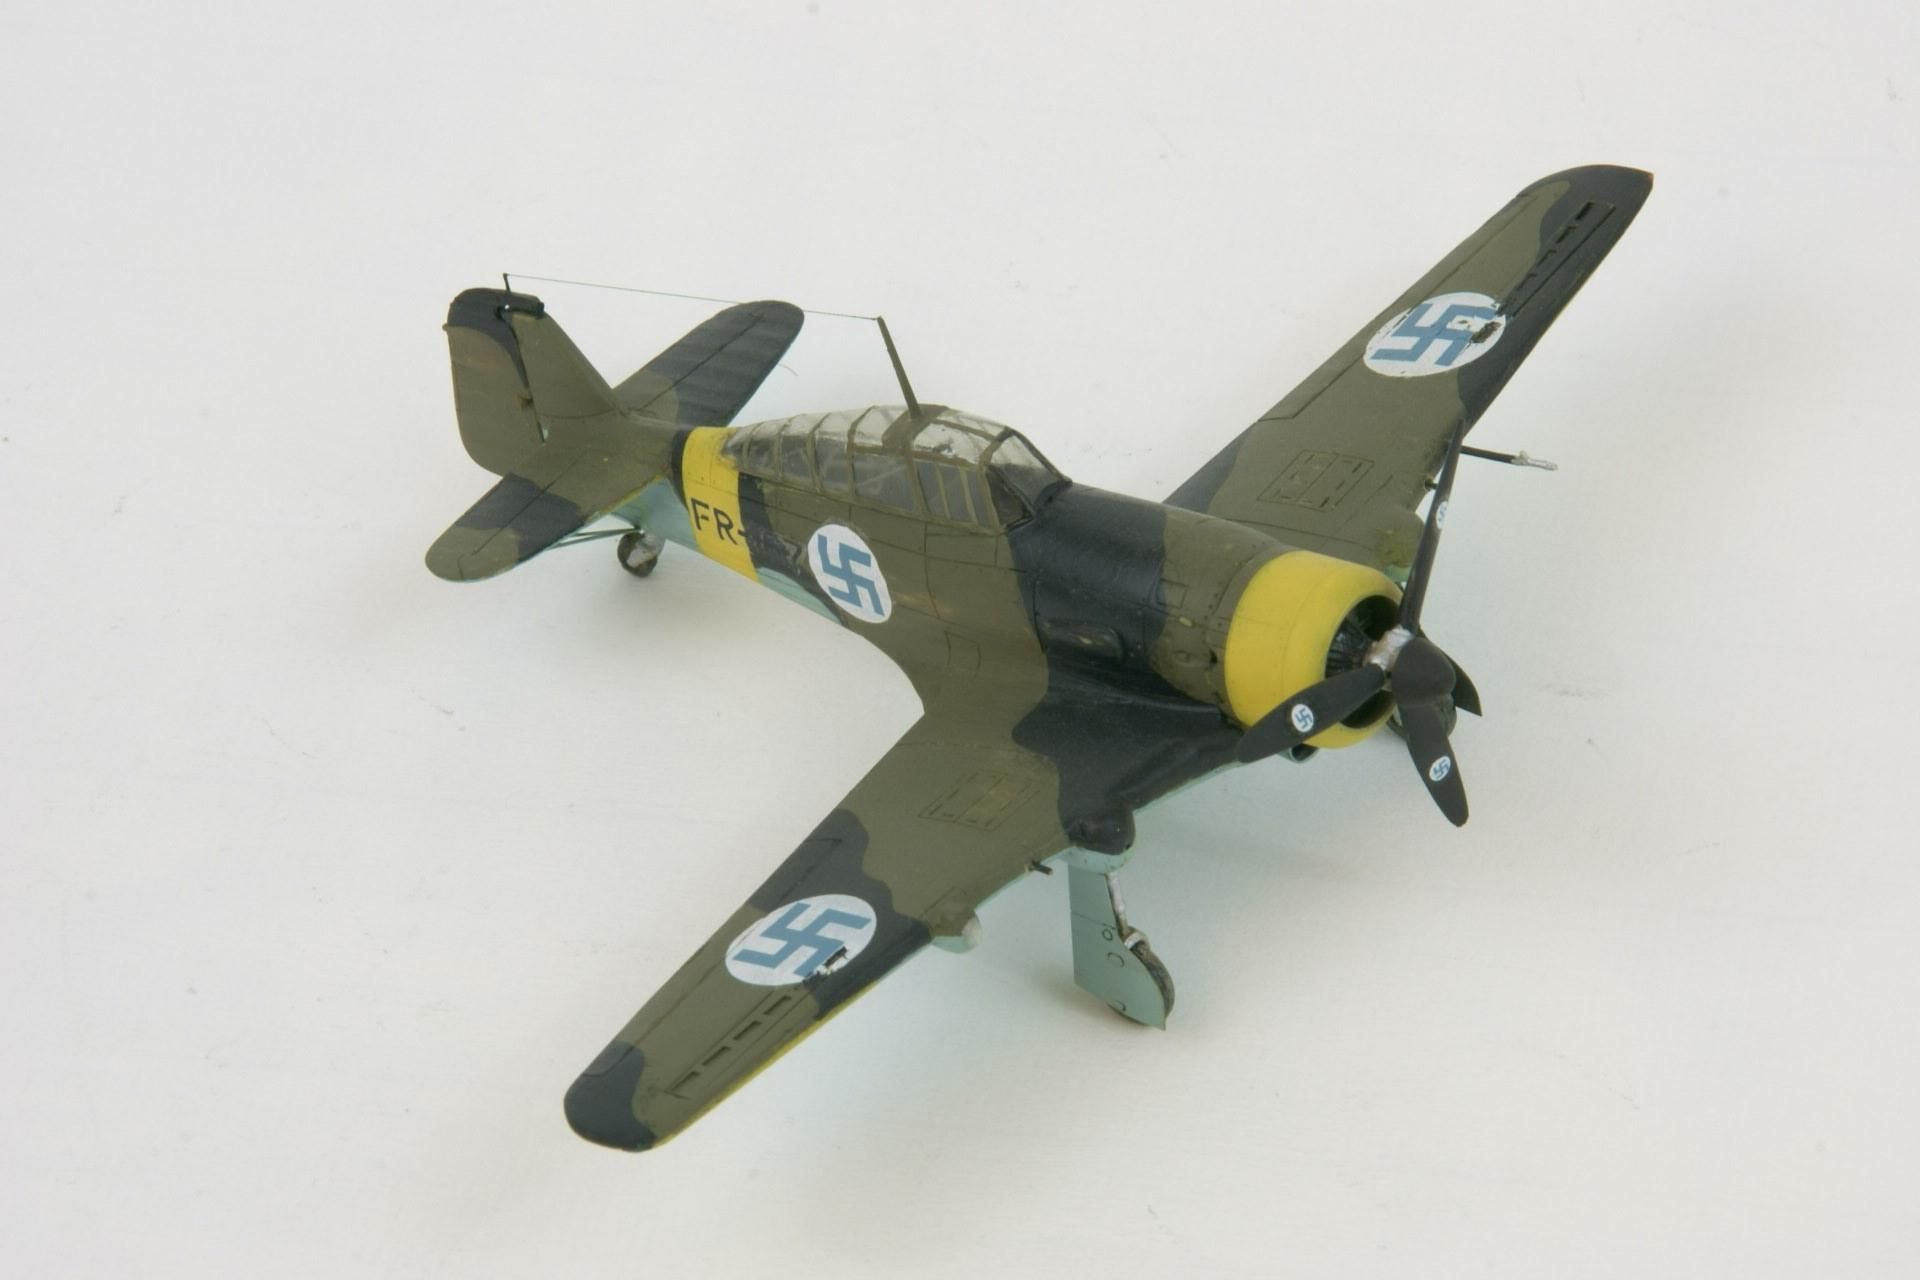 Fokker d xxi series 4 modified 6